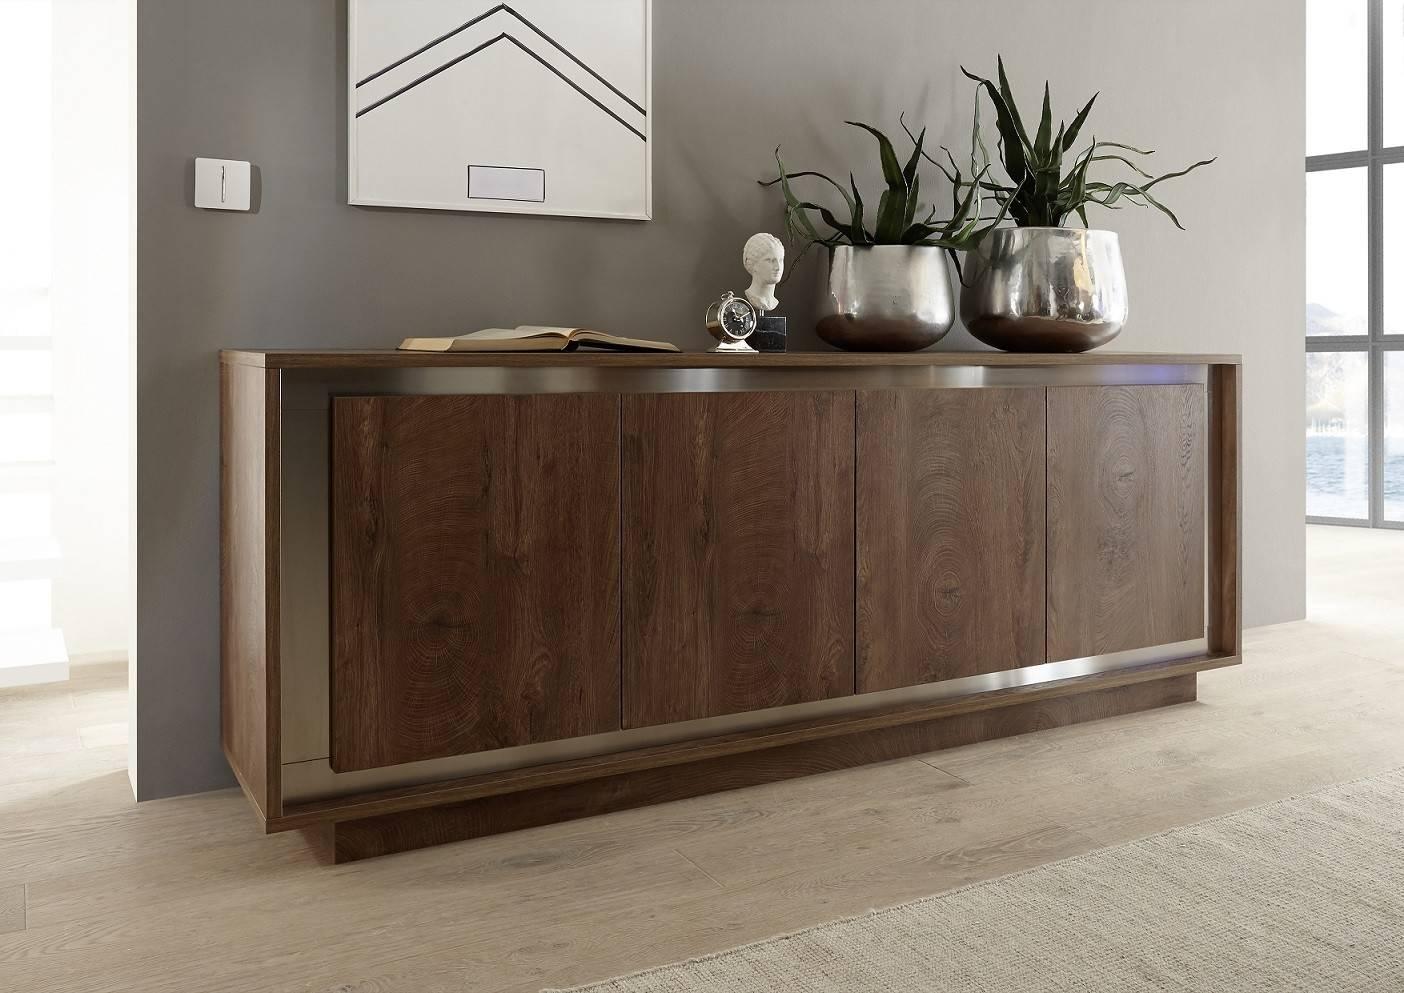 Modern Sideboards Uk – Sena Home Furniture Intended For Modern Contemporary Sideboards (#15 of 20)